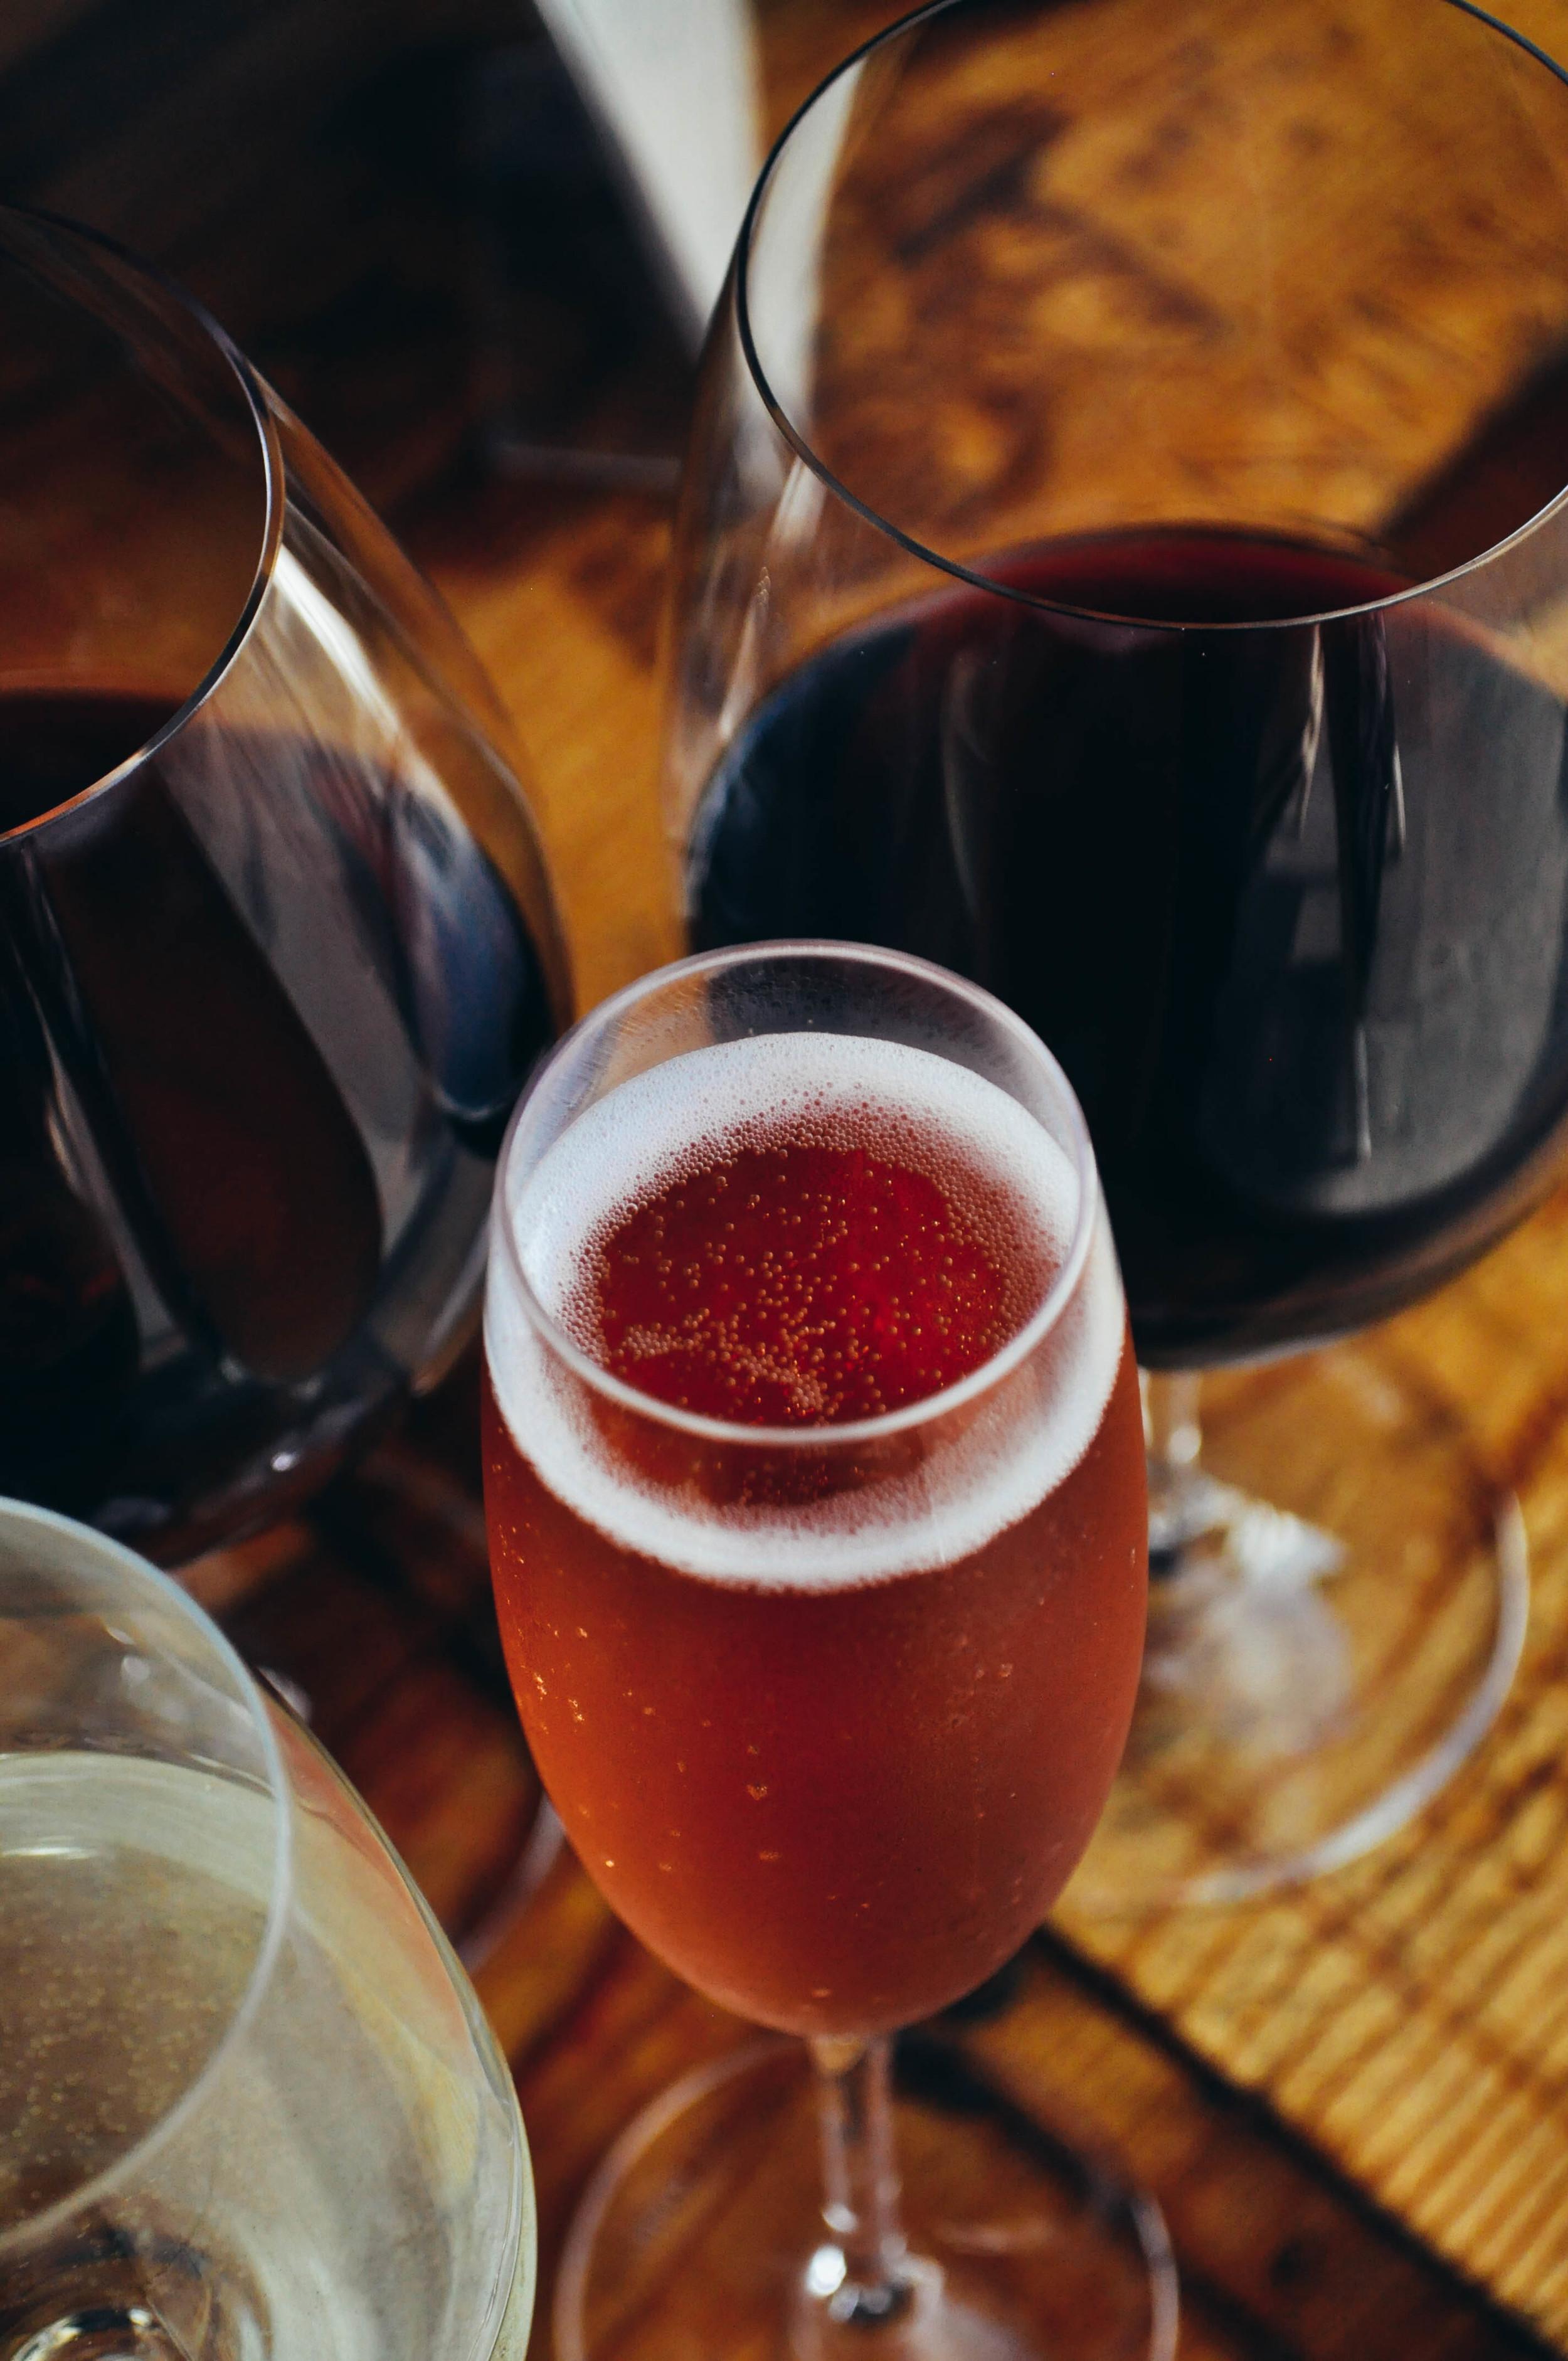 glasses w wine.jpg